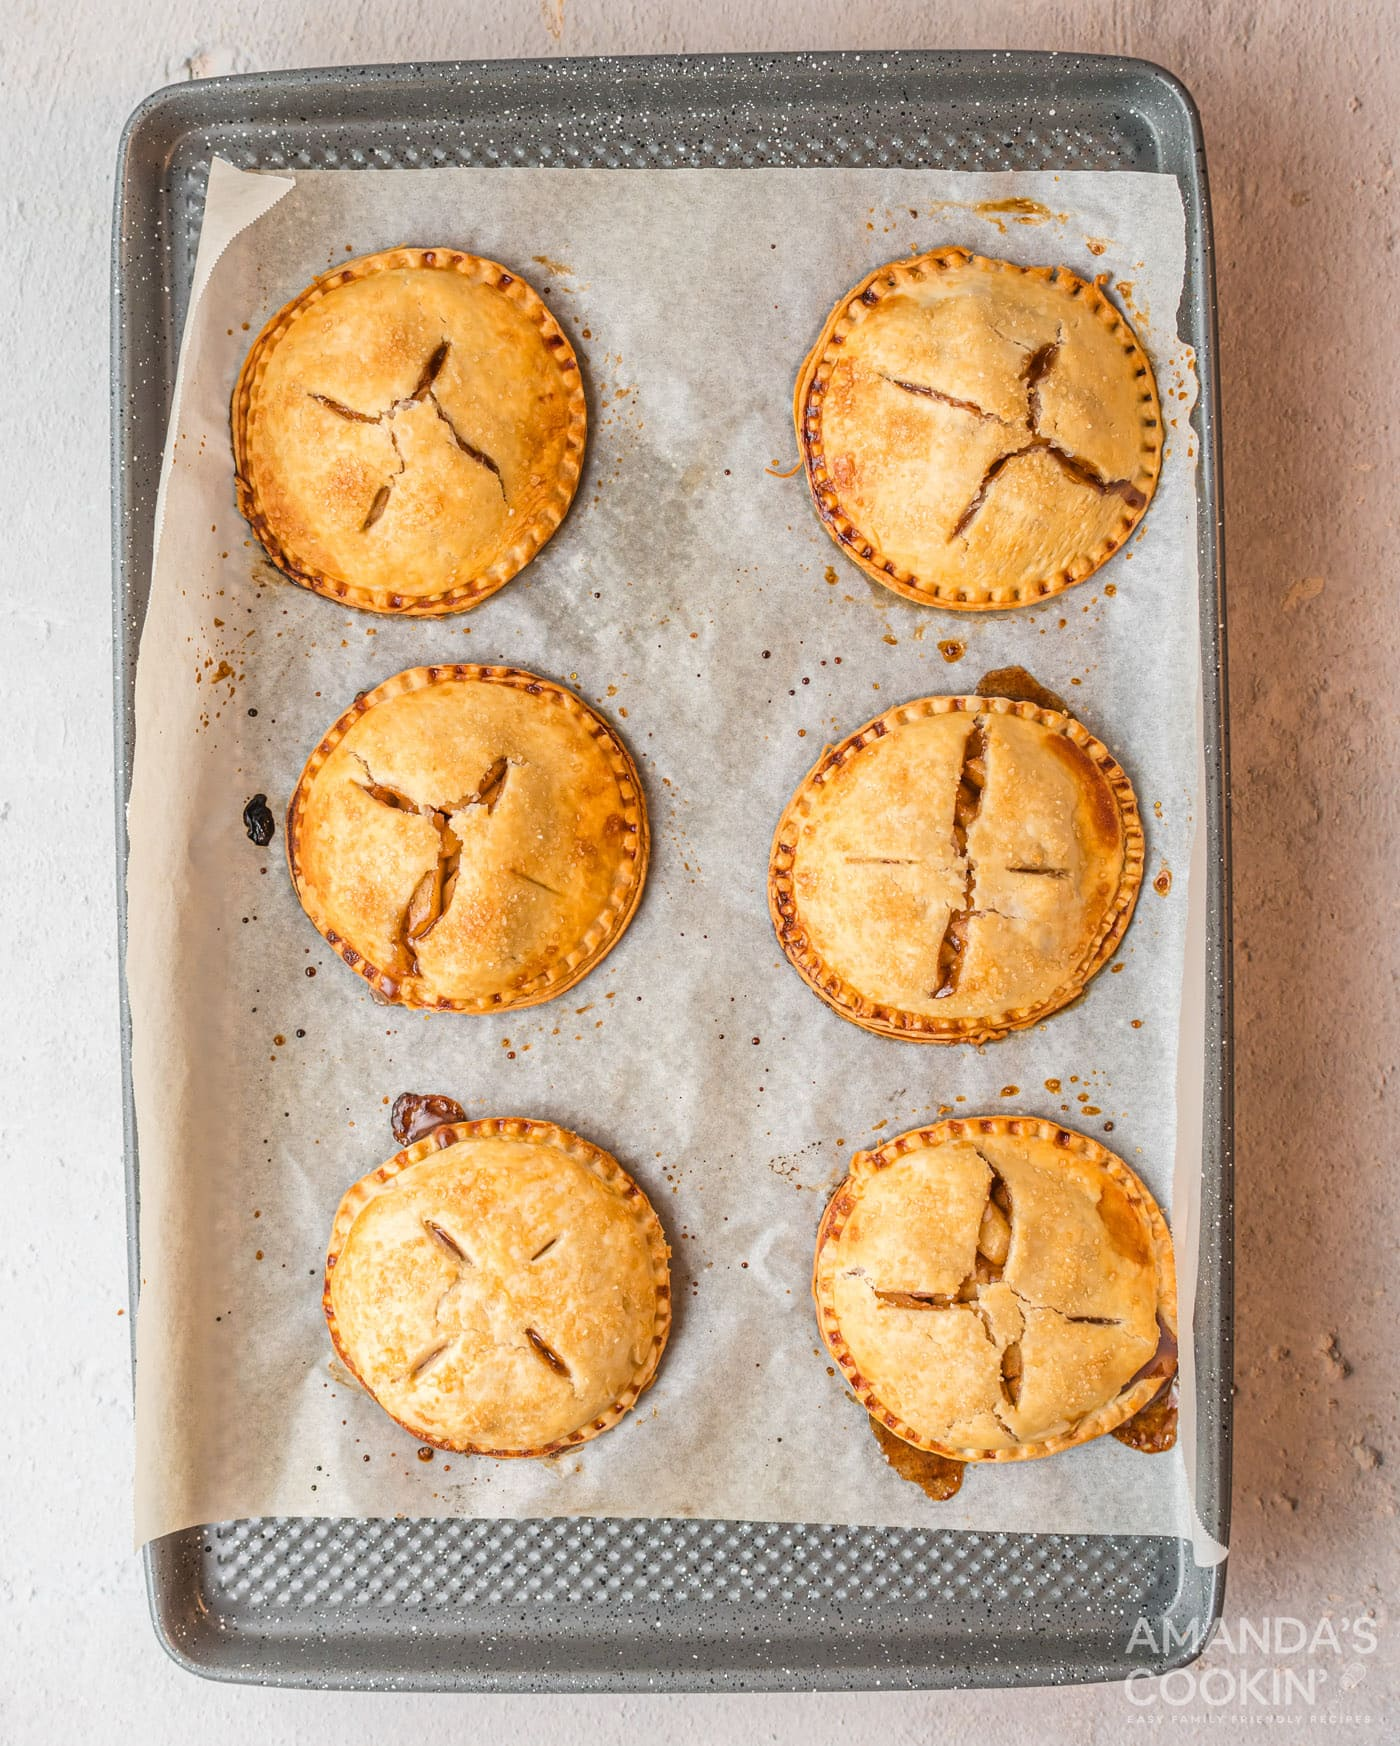 golden brown apple hand pies on baking sheet